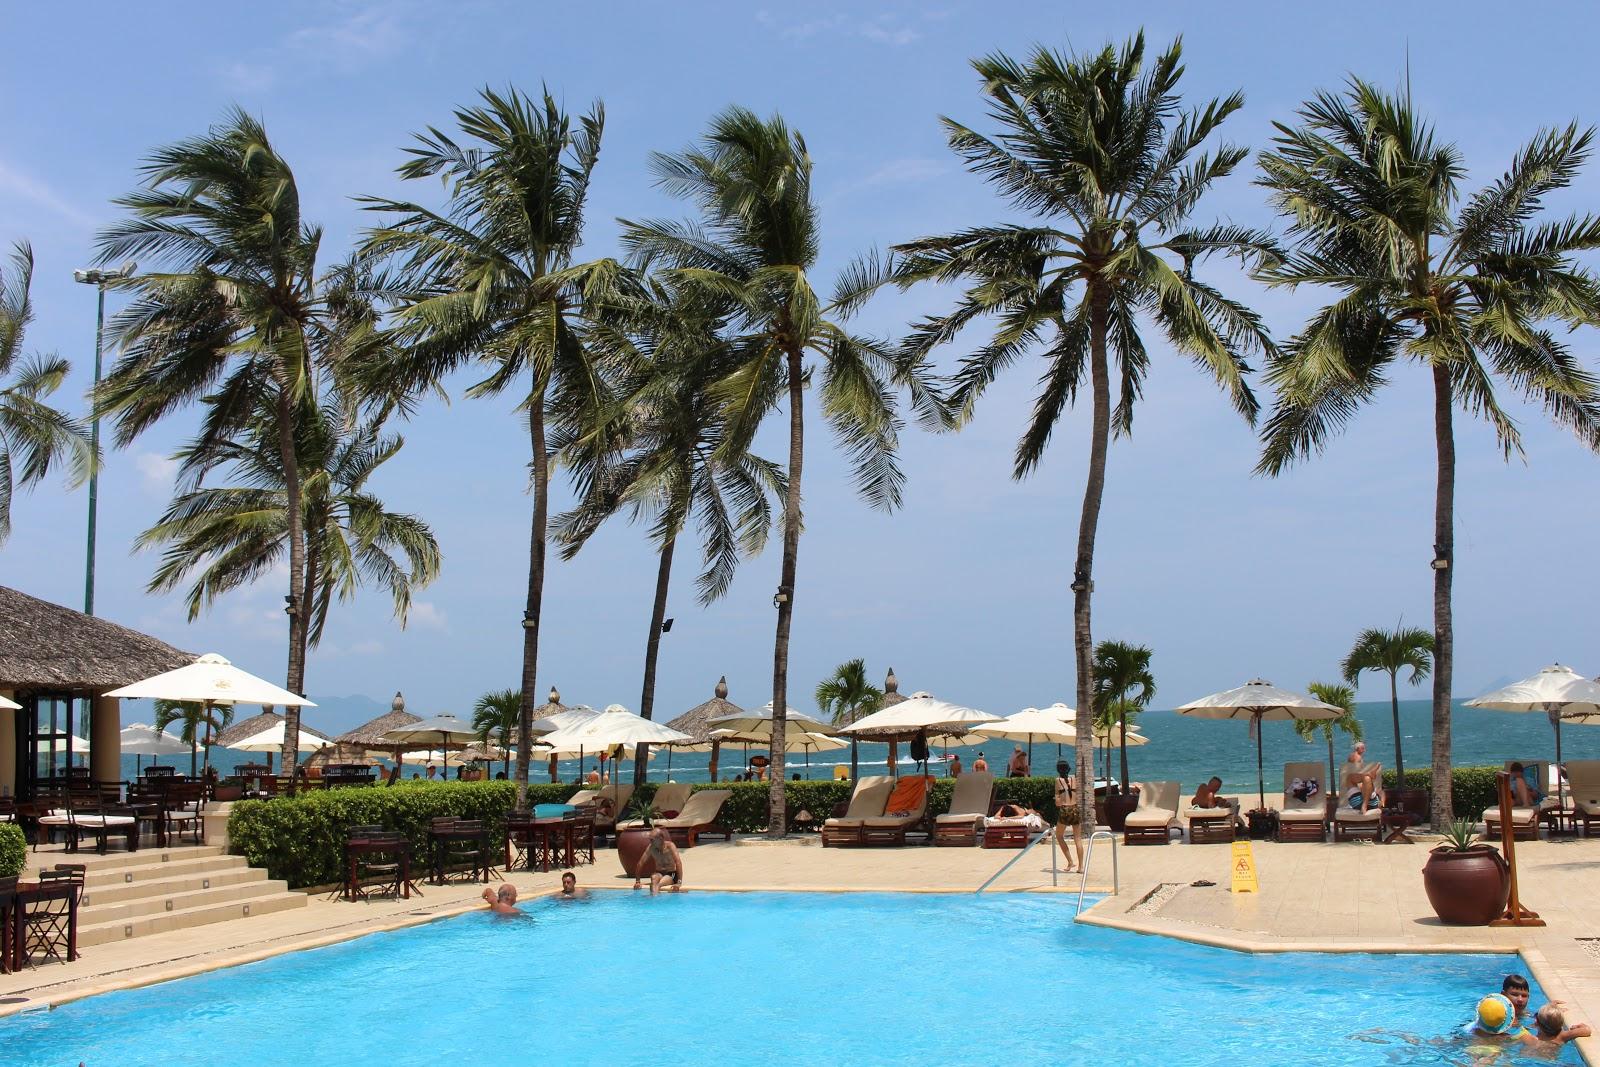 Nha Trang Vietnam Travel Guide